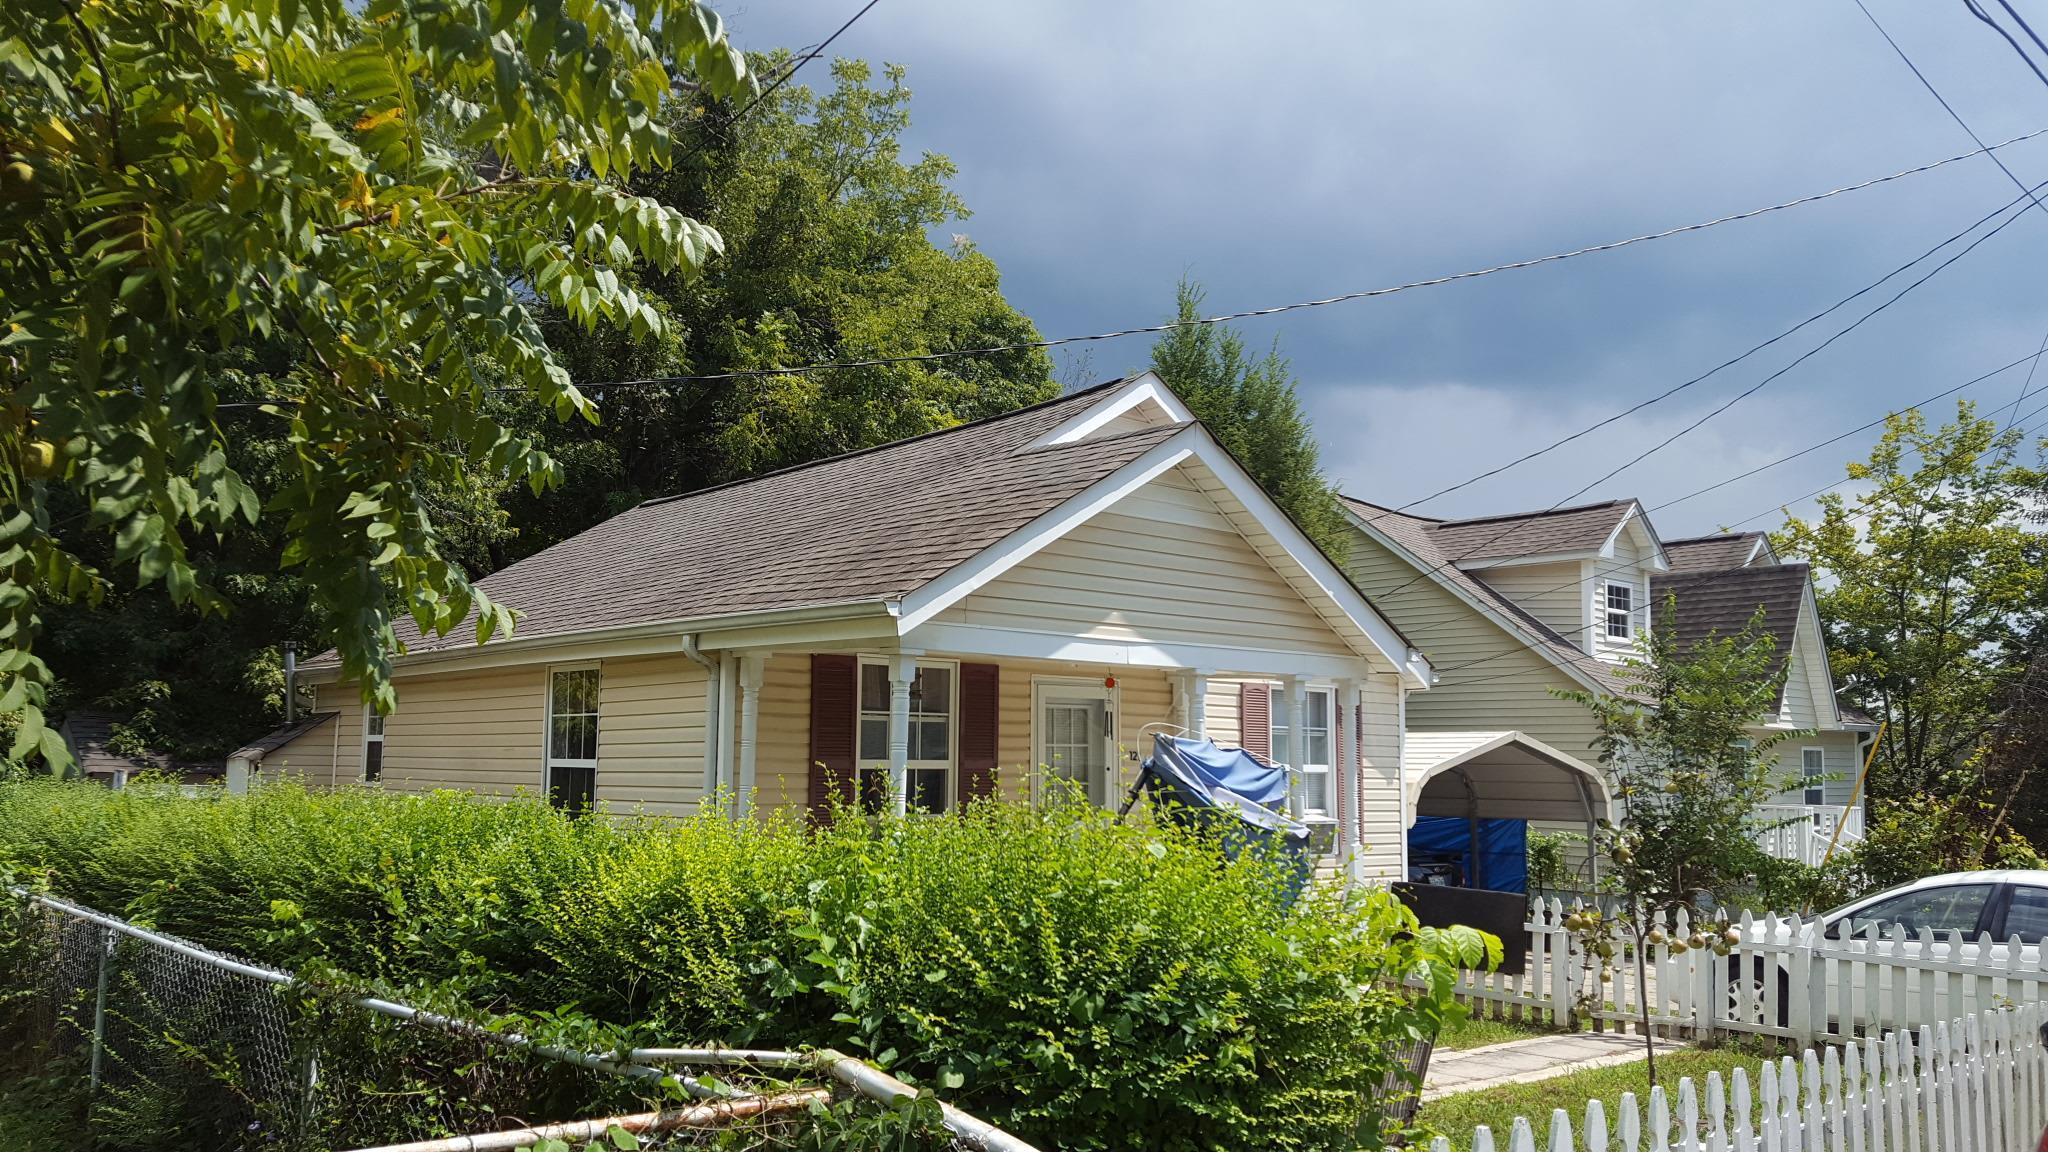 121 Oak St, Mc Minnville, TN 37110